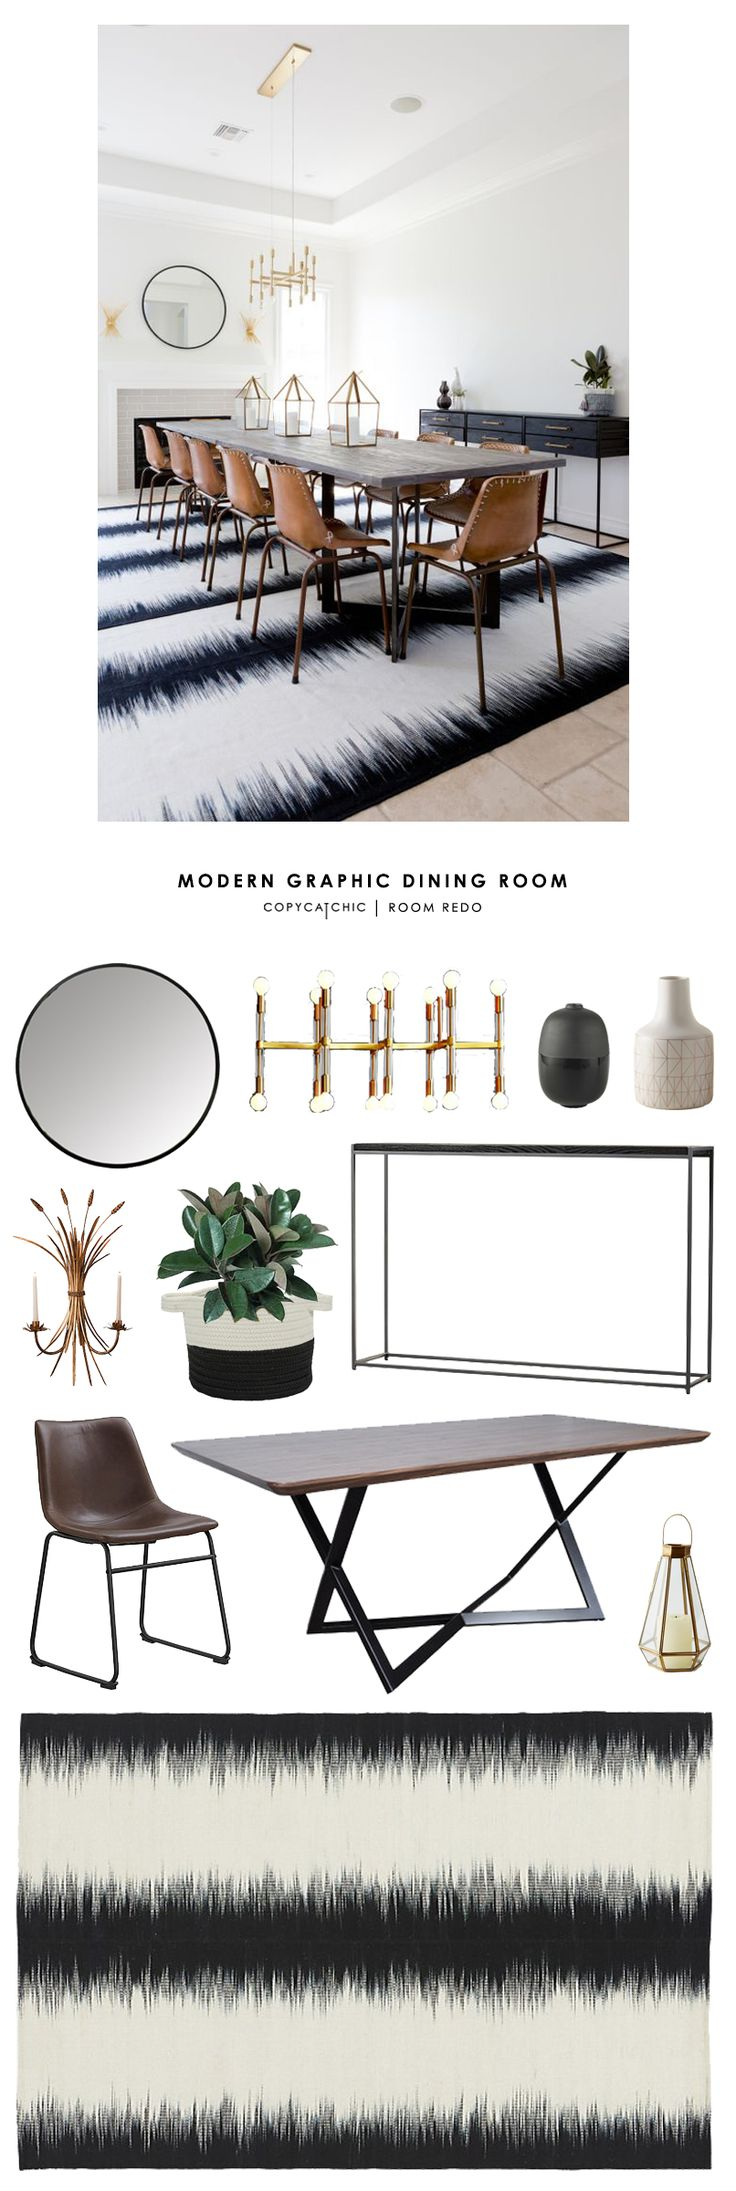 Copy Cat Chic Room Redo | Modern Graphic Dining Room